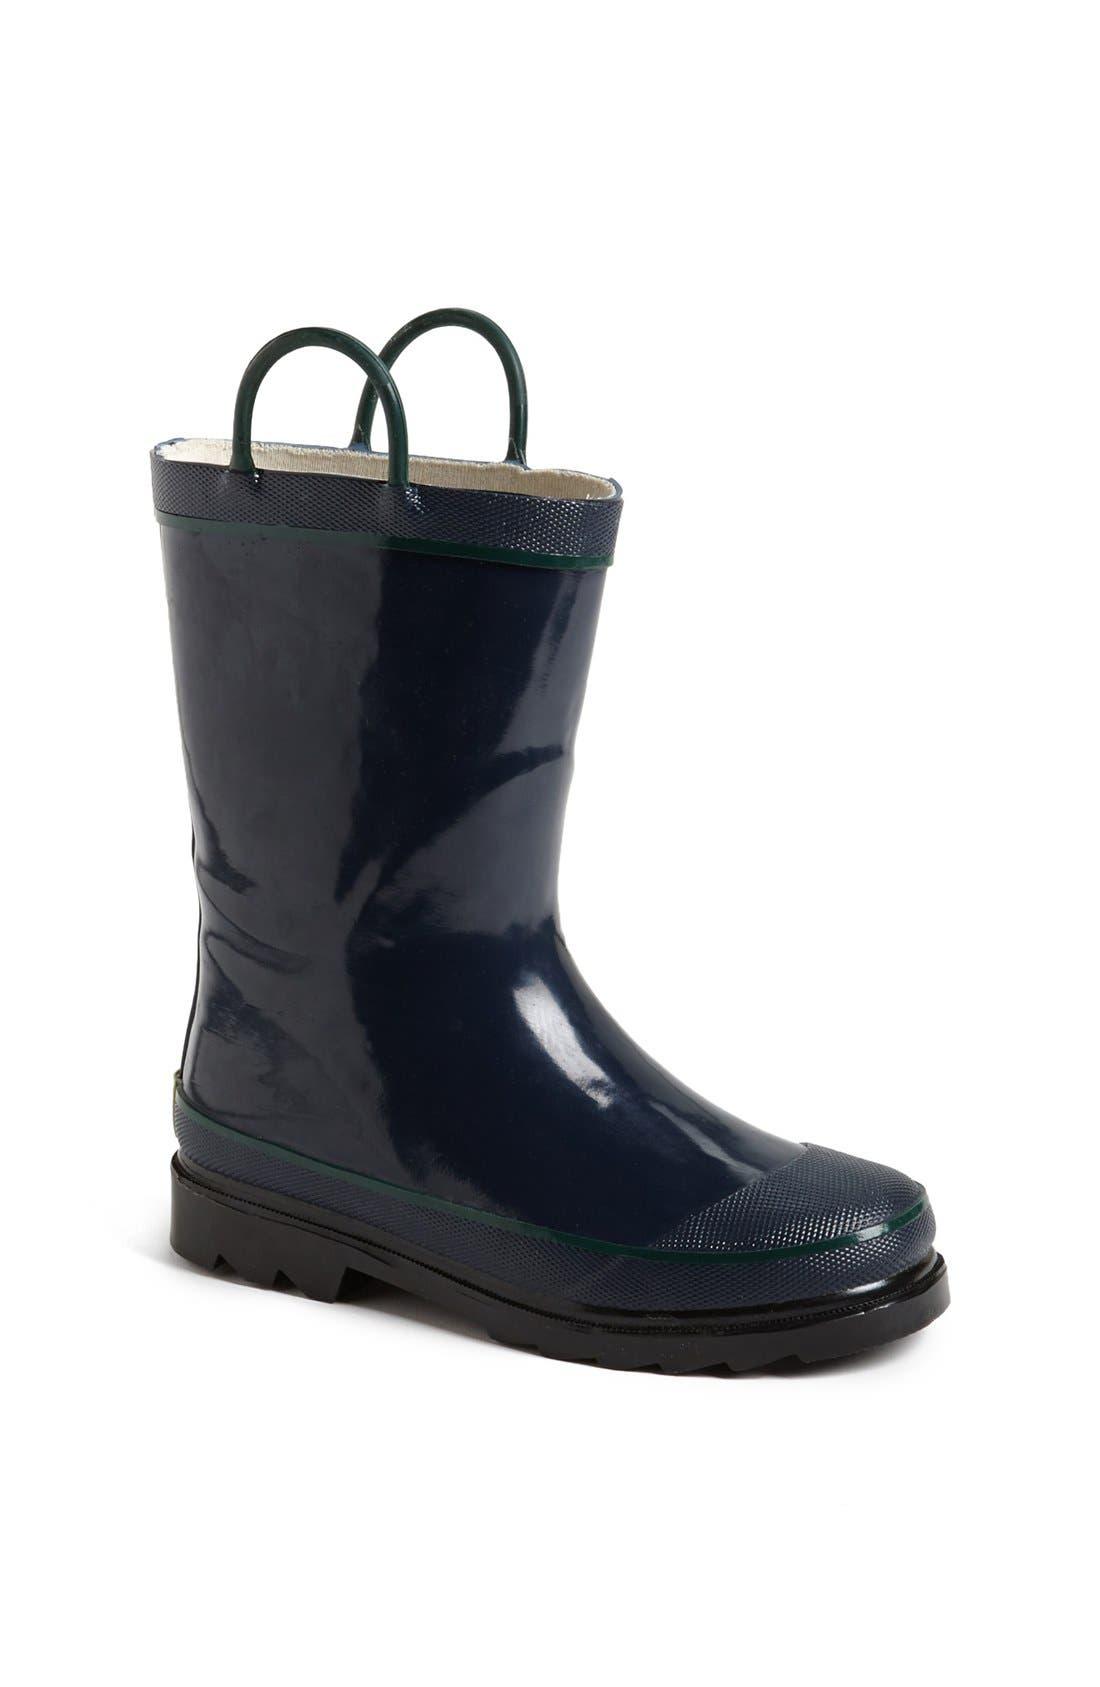 Firechief 2 Waterproof Rain Boot,                             Main thumbnail 1, color,                             NAVY